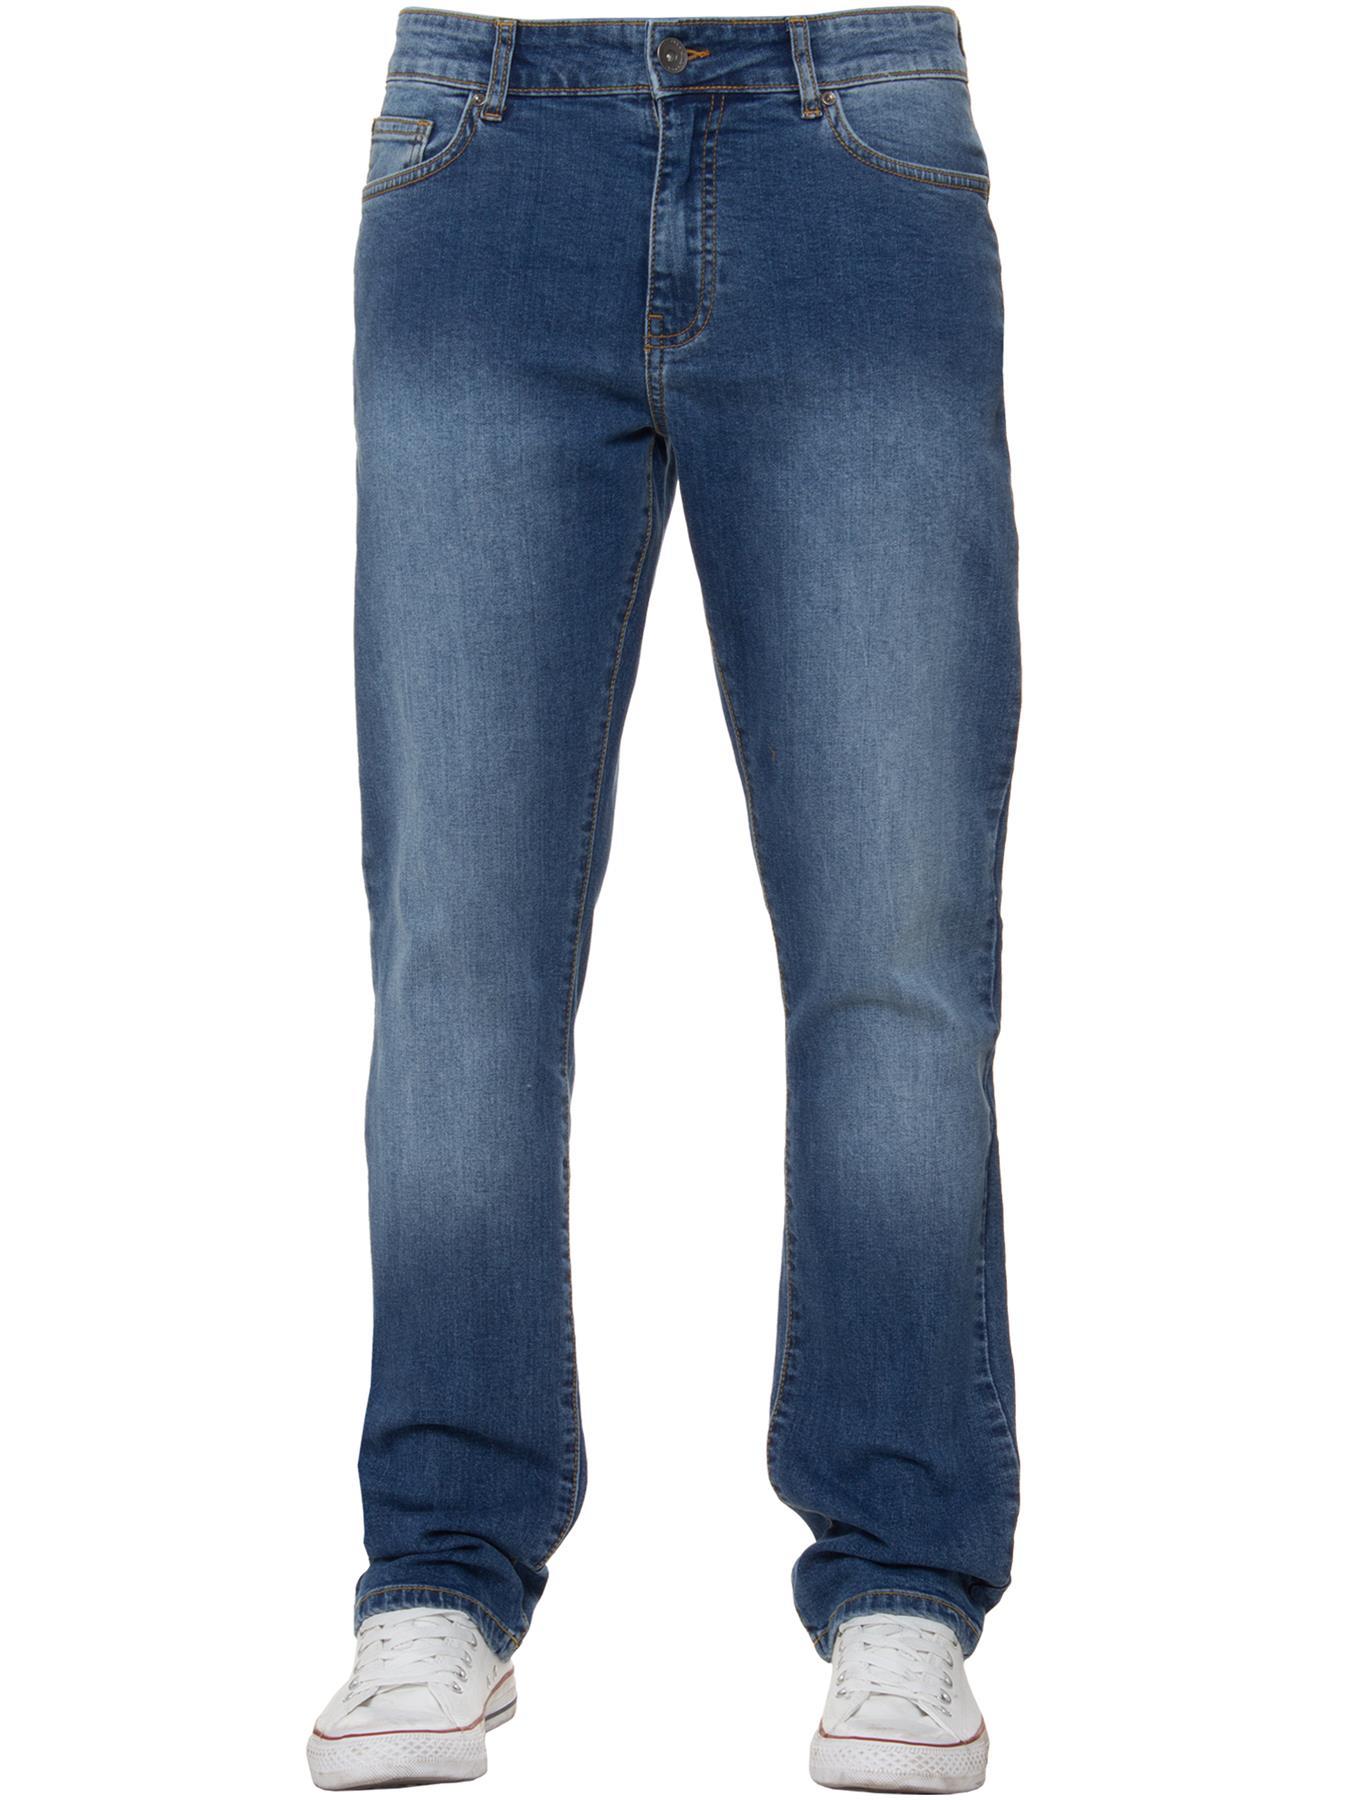 Para-Hombre-Pierna-Recta-Bootcut-Stretch-Denim-Regulares-Pantalon-de-trabajo-Kruze-Todas-Cinturas miniatura 12